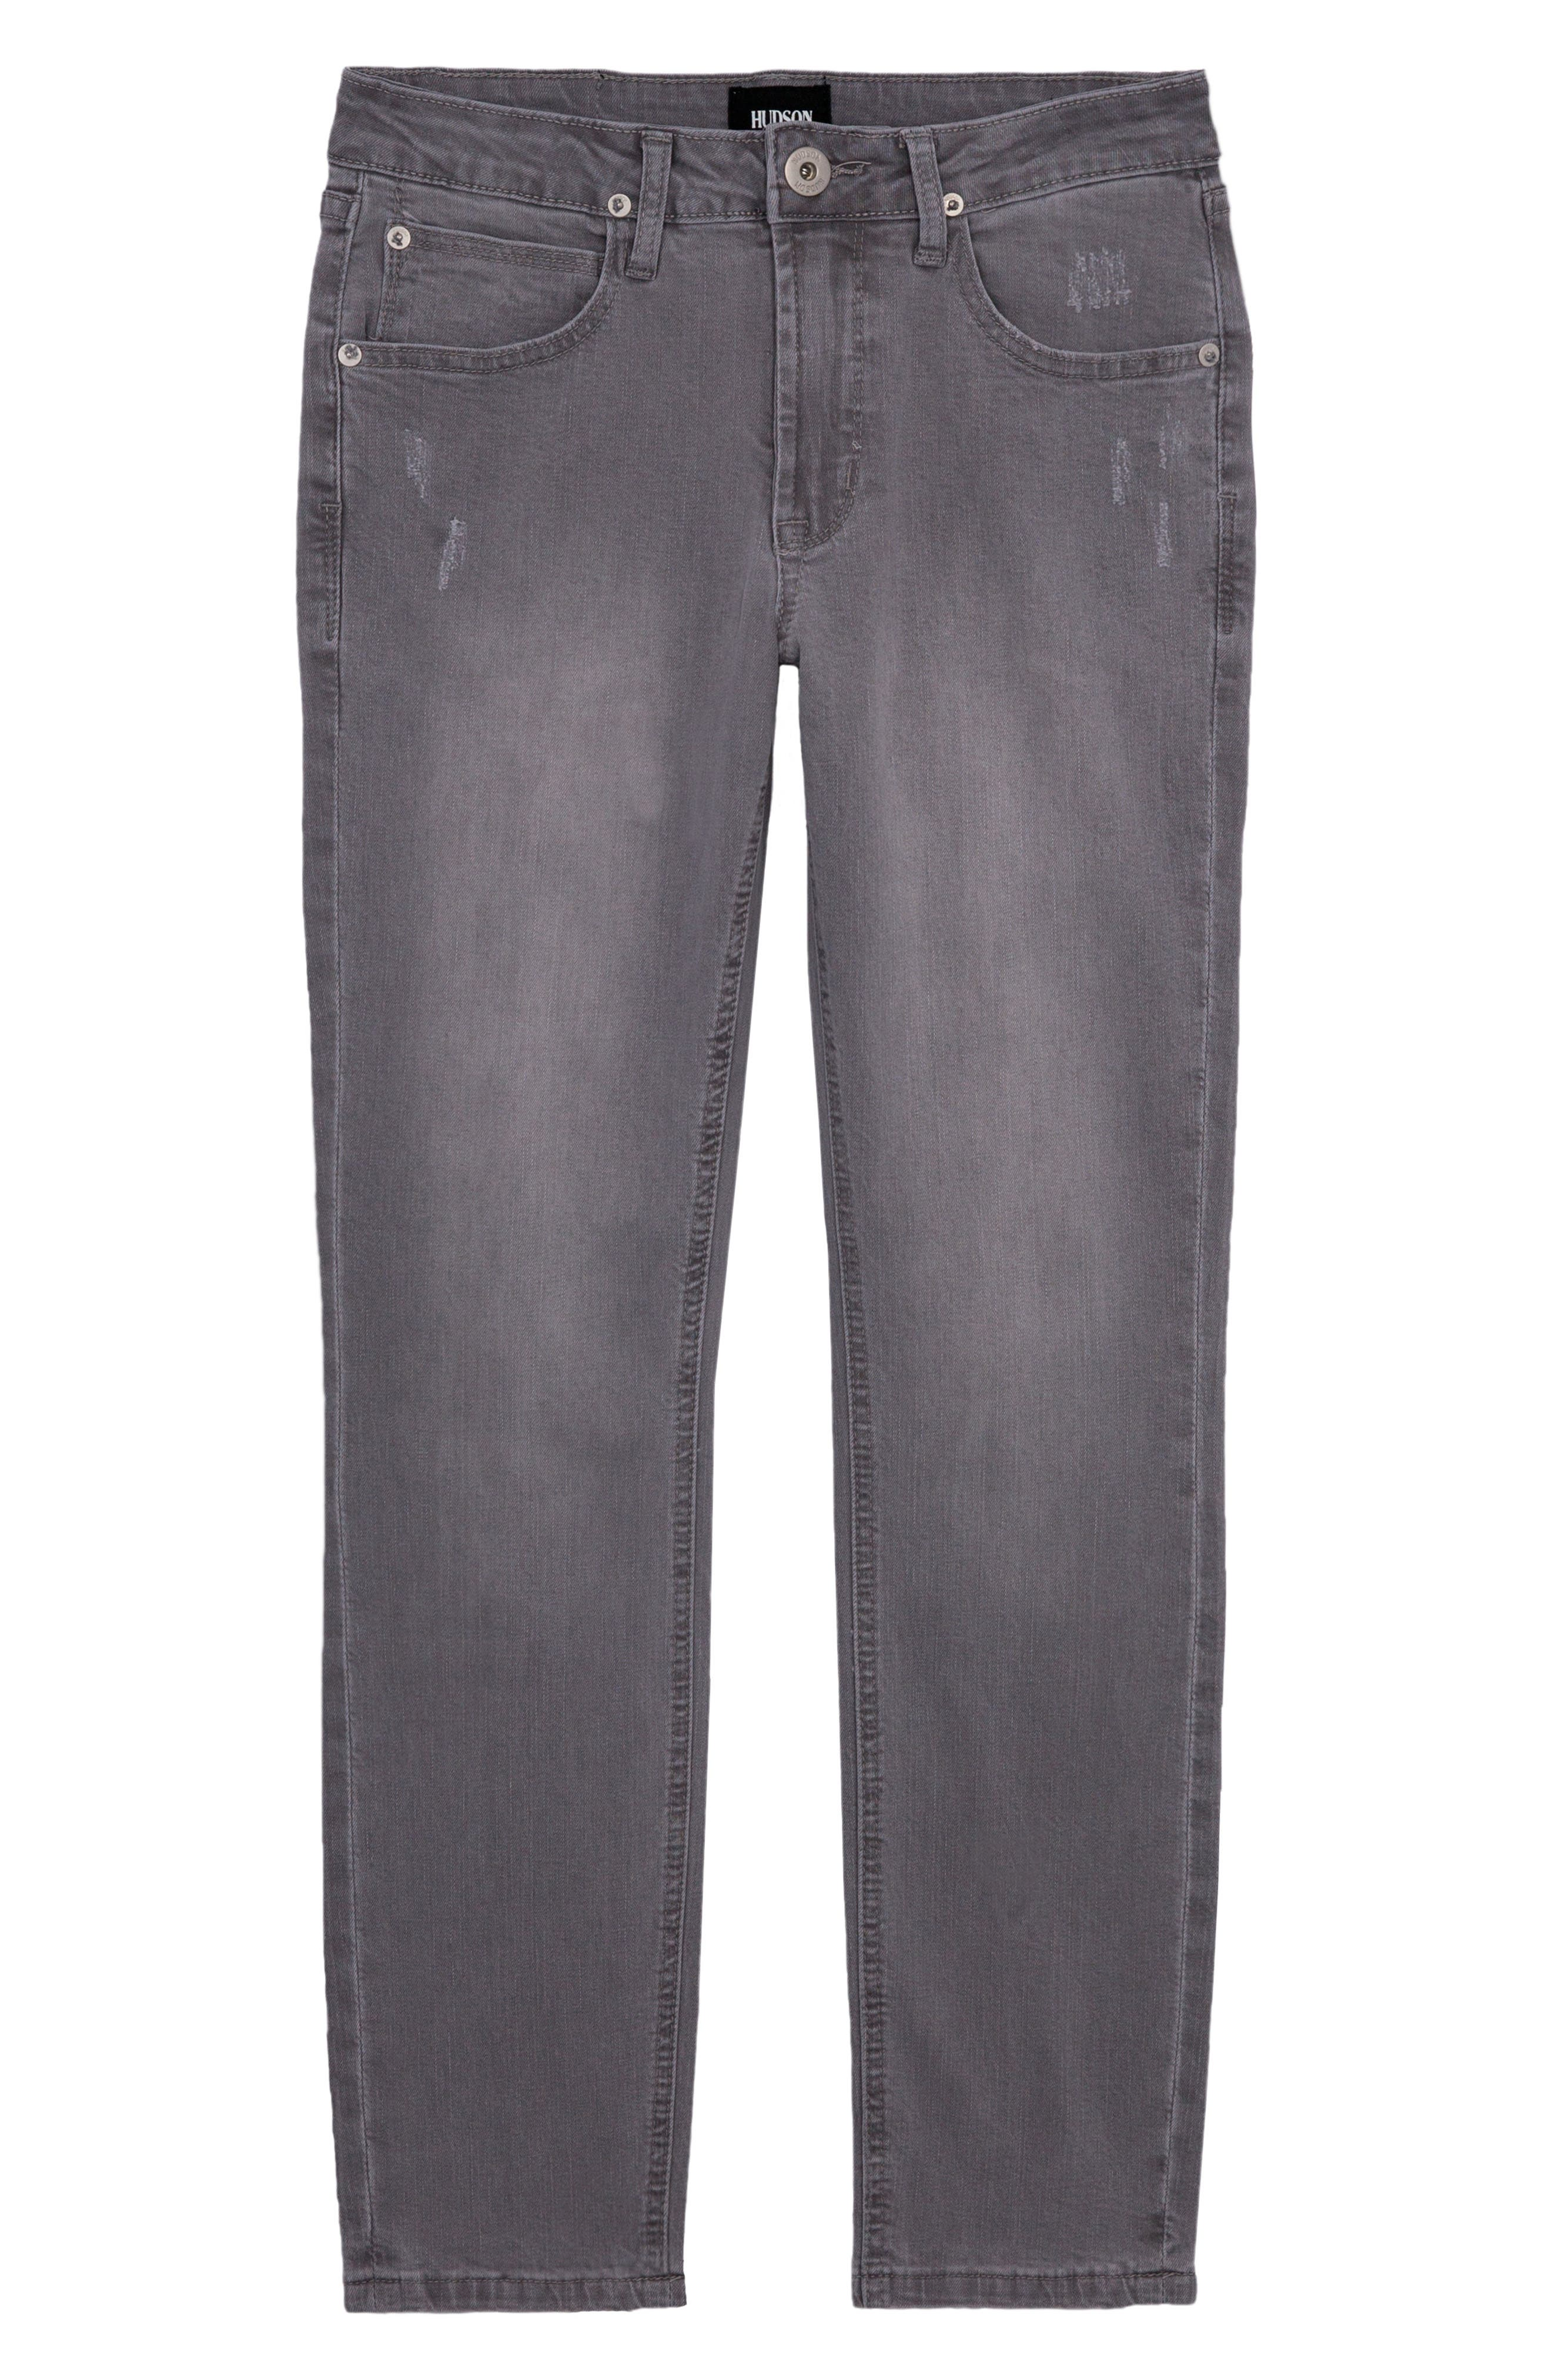 HUDSON KIDS, Straight Leg Jeans, Main thumbnail 1, color, 050